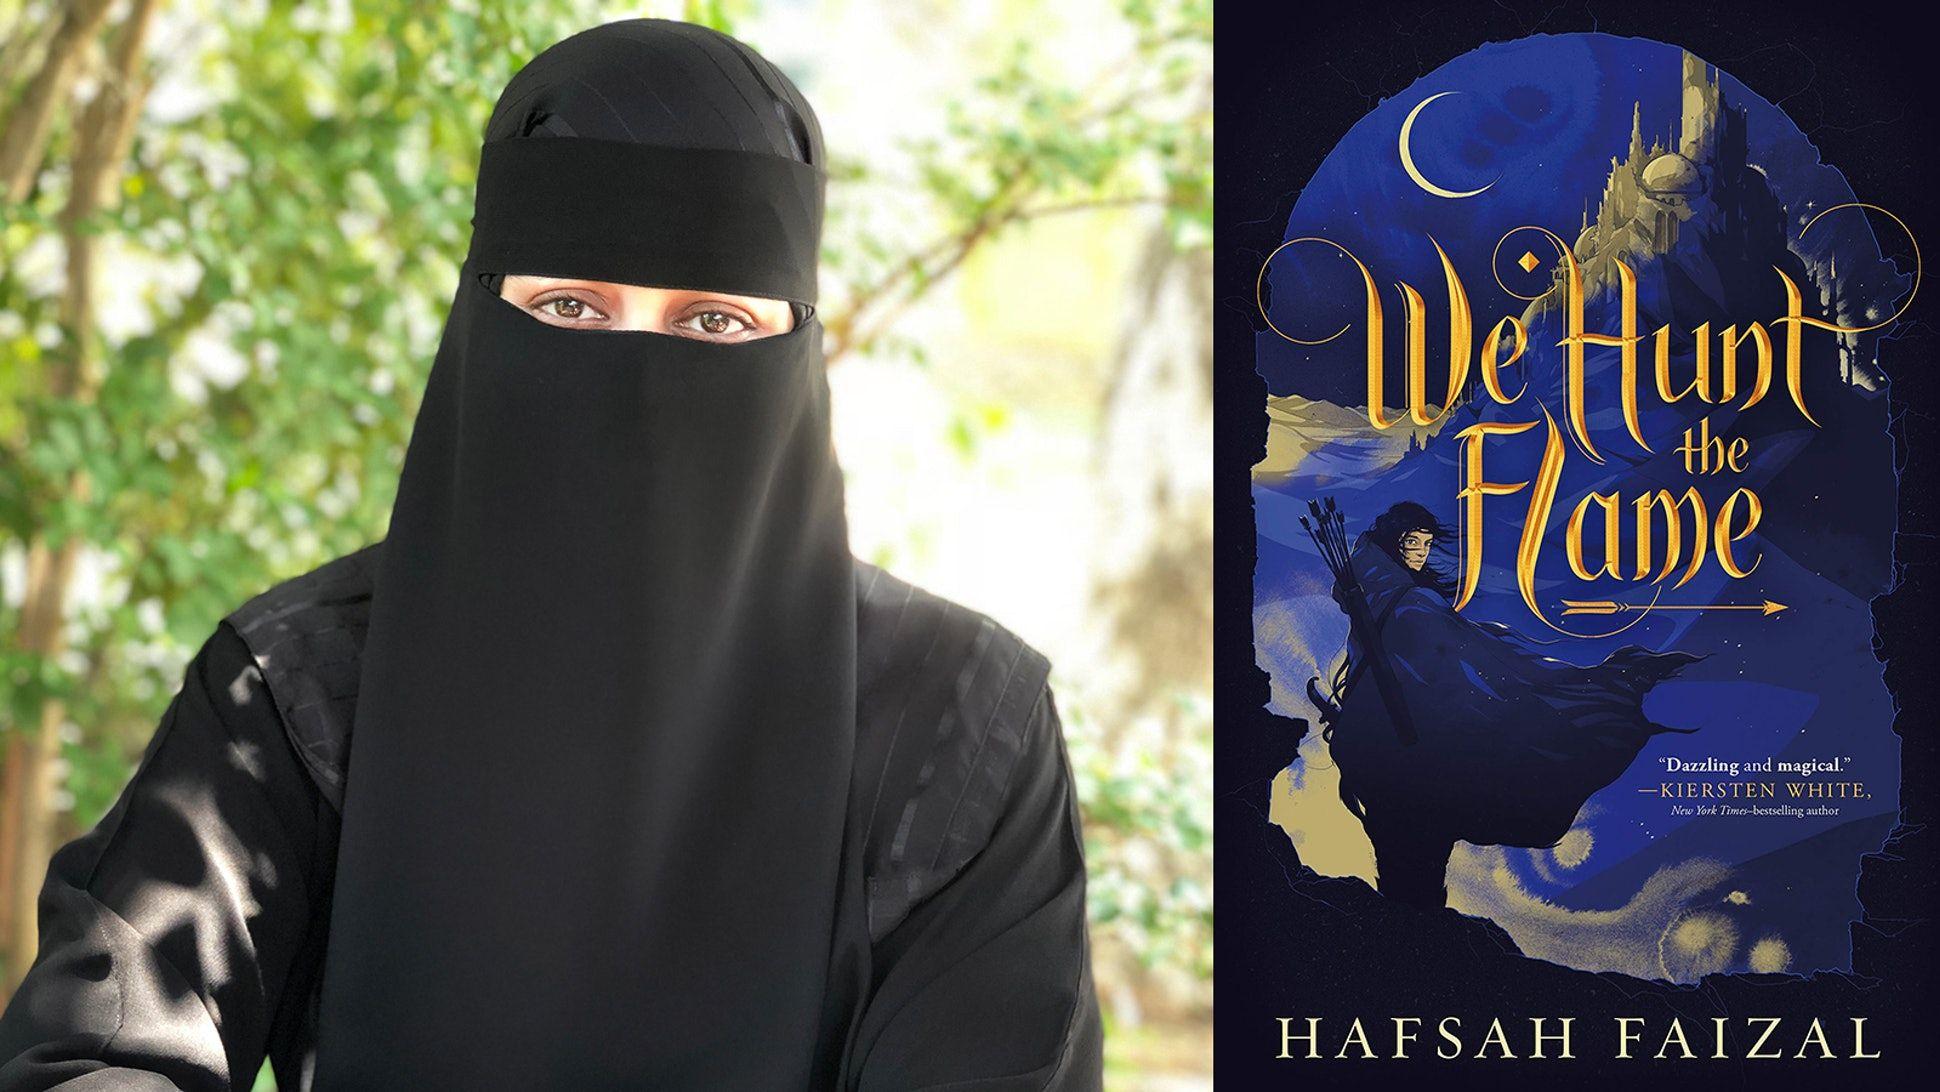 'We Hunt The Flame' by Hafsah Faizal #middleeast